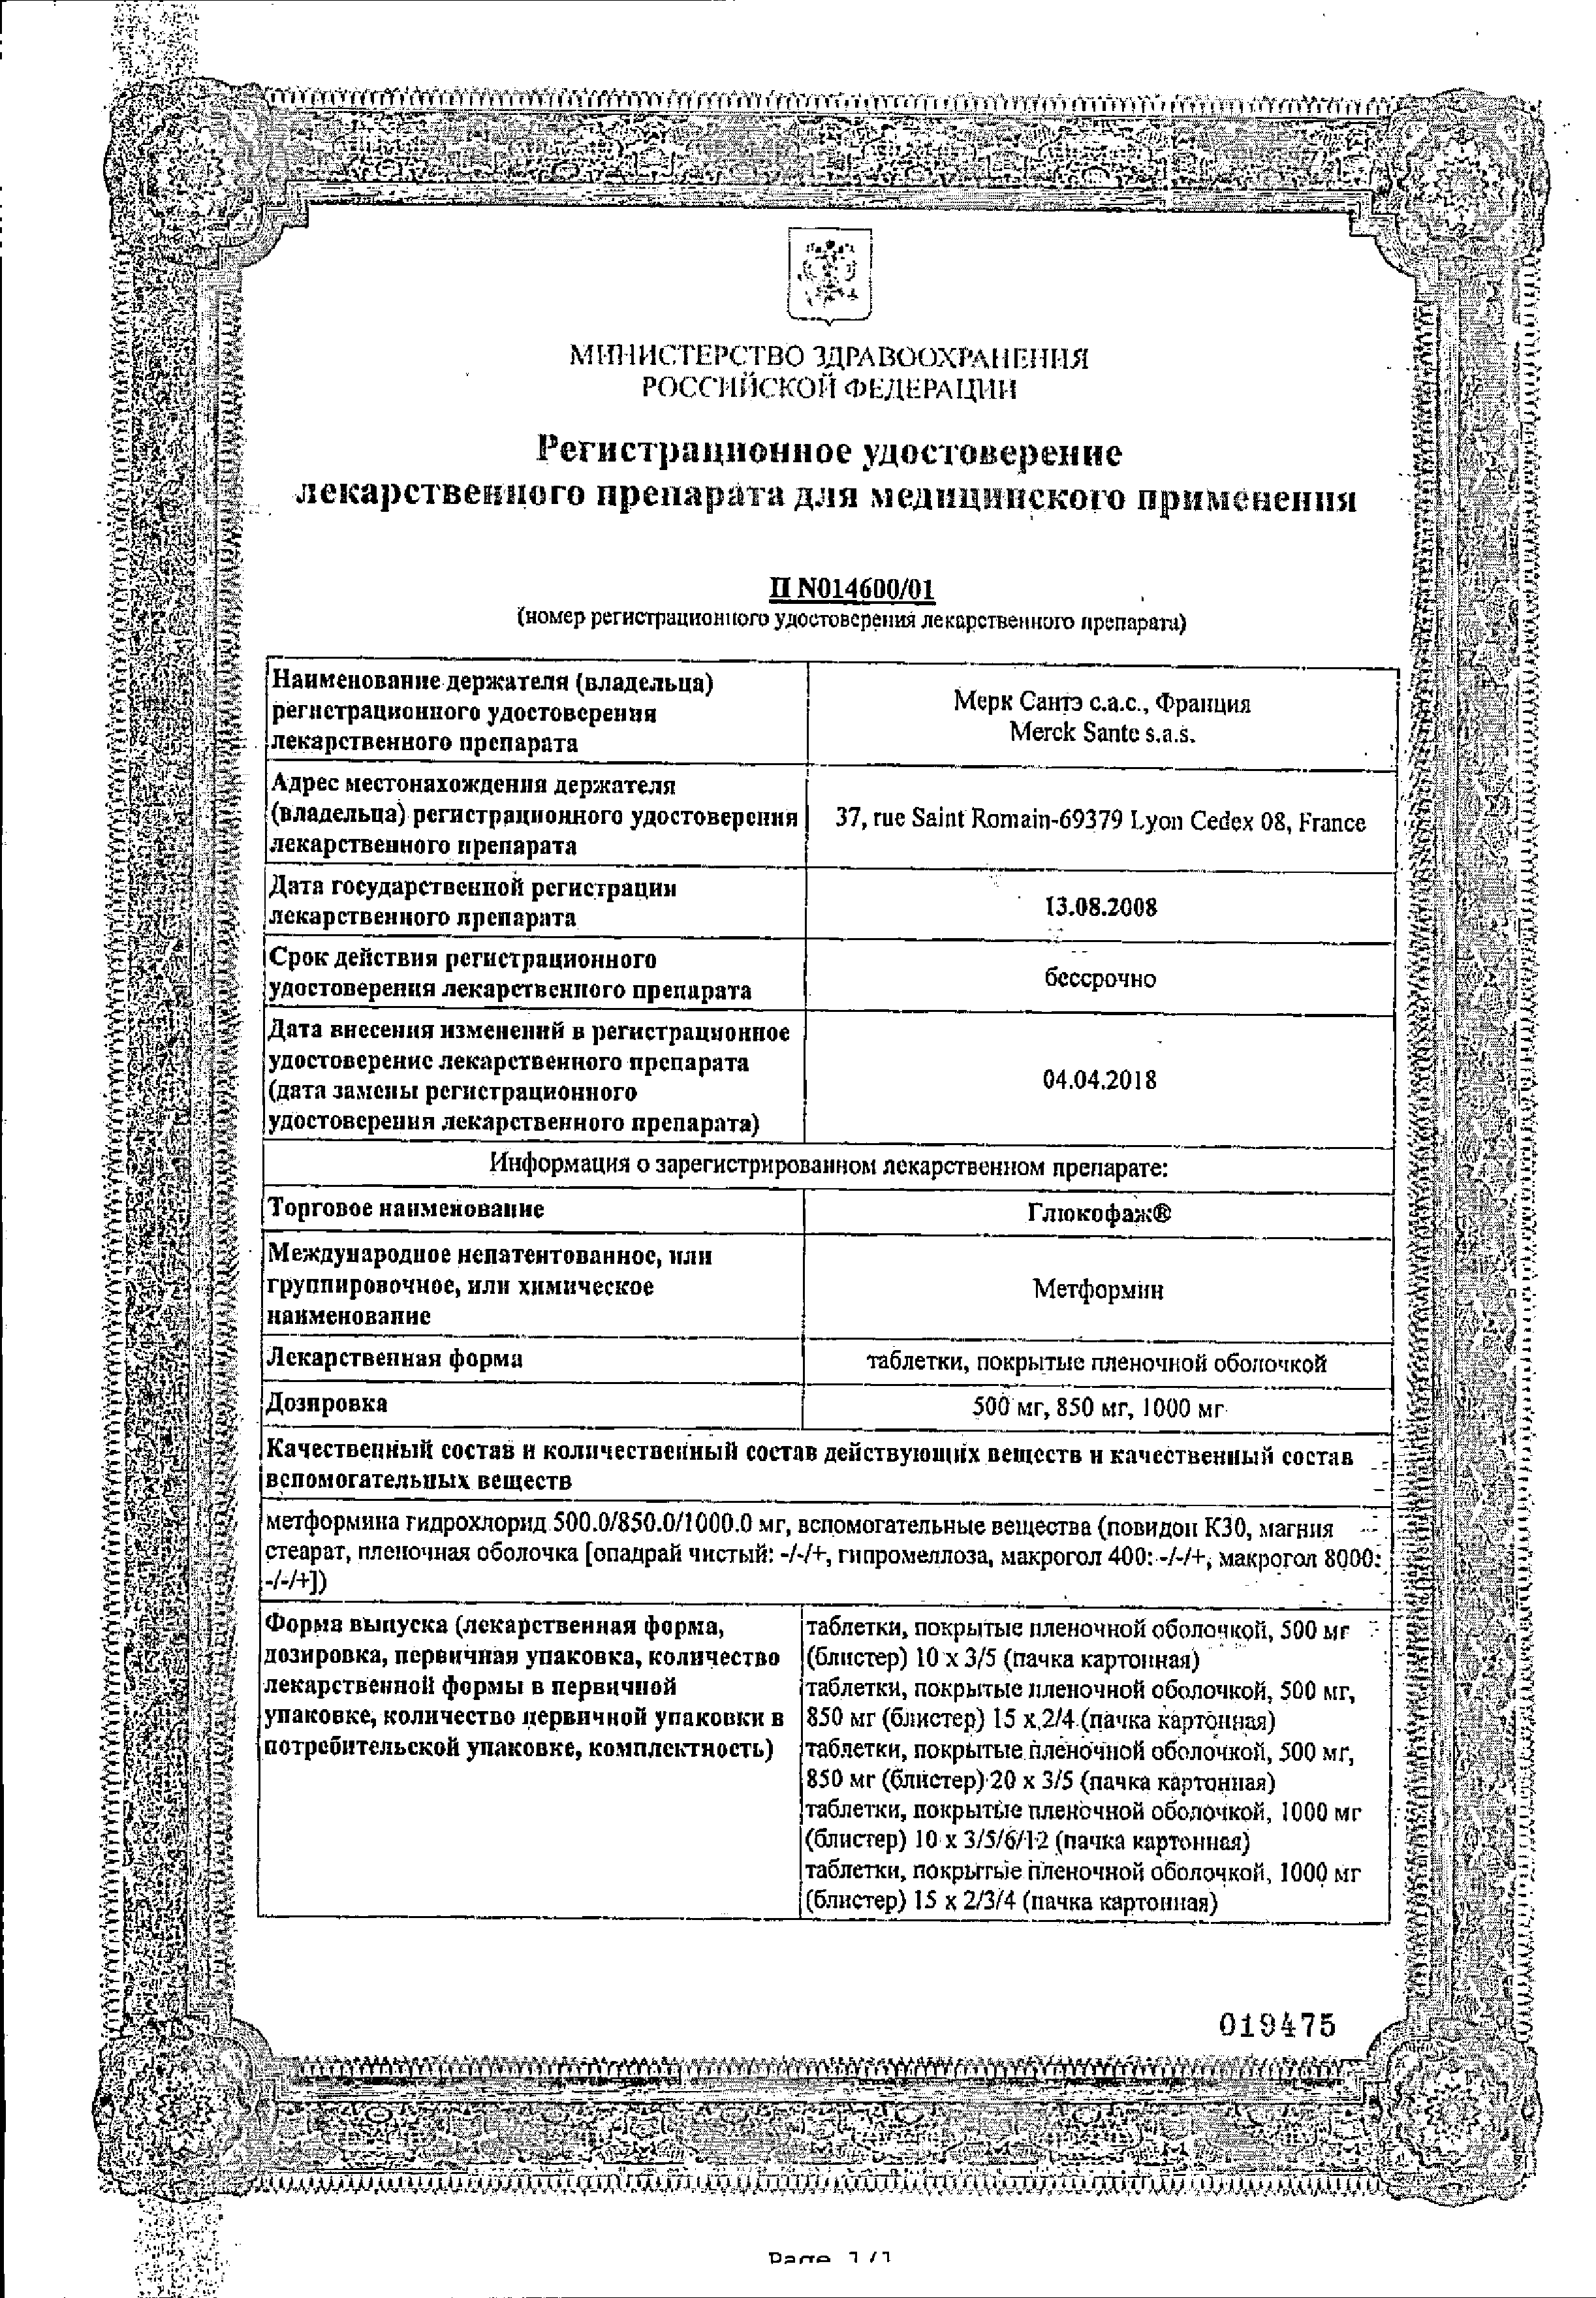 Глюкофаж сертификат